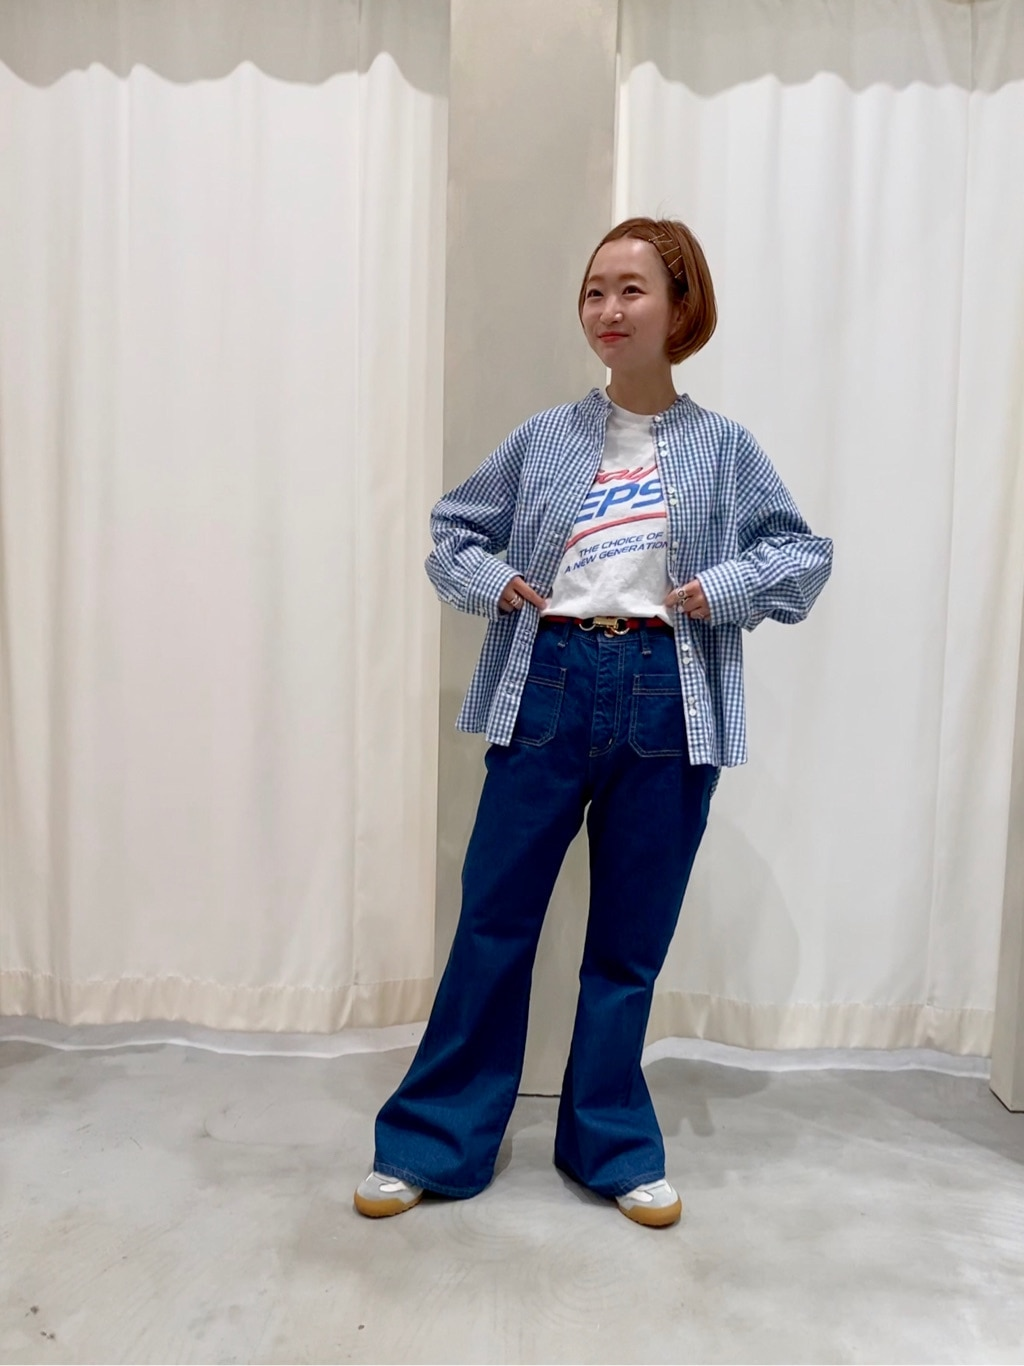 - CHILD WOMAN CHILD WOMAN , PAR ICI 東京スカイツリータウン・ソラマチ 身長:150cm 2021.05.24